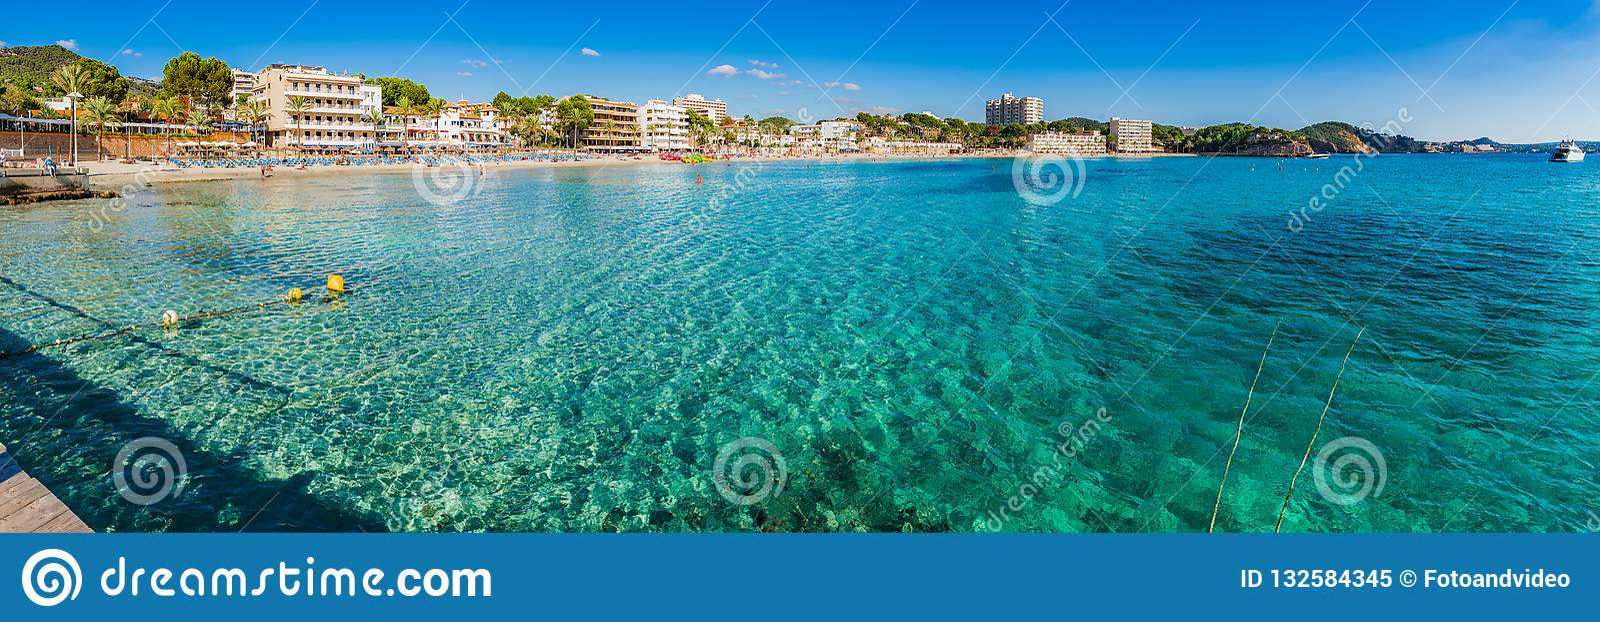 Majorca Spain, beach seaside of coast in Paguera, panorama view